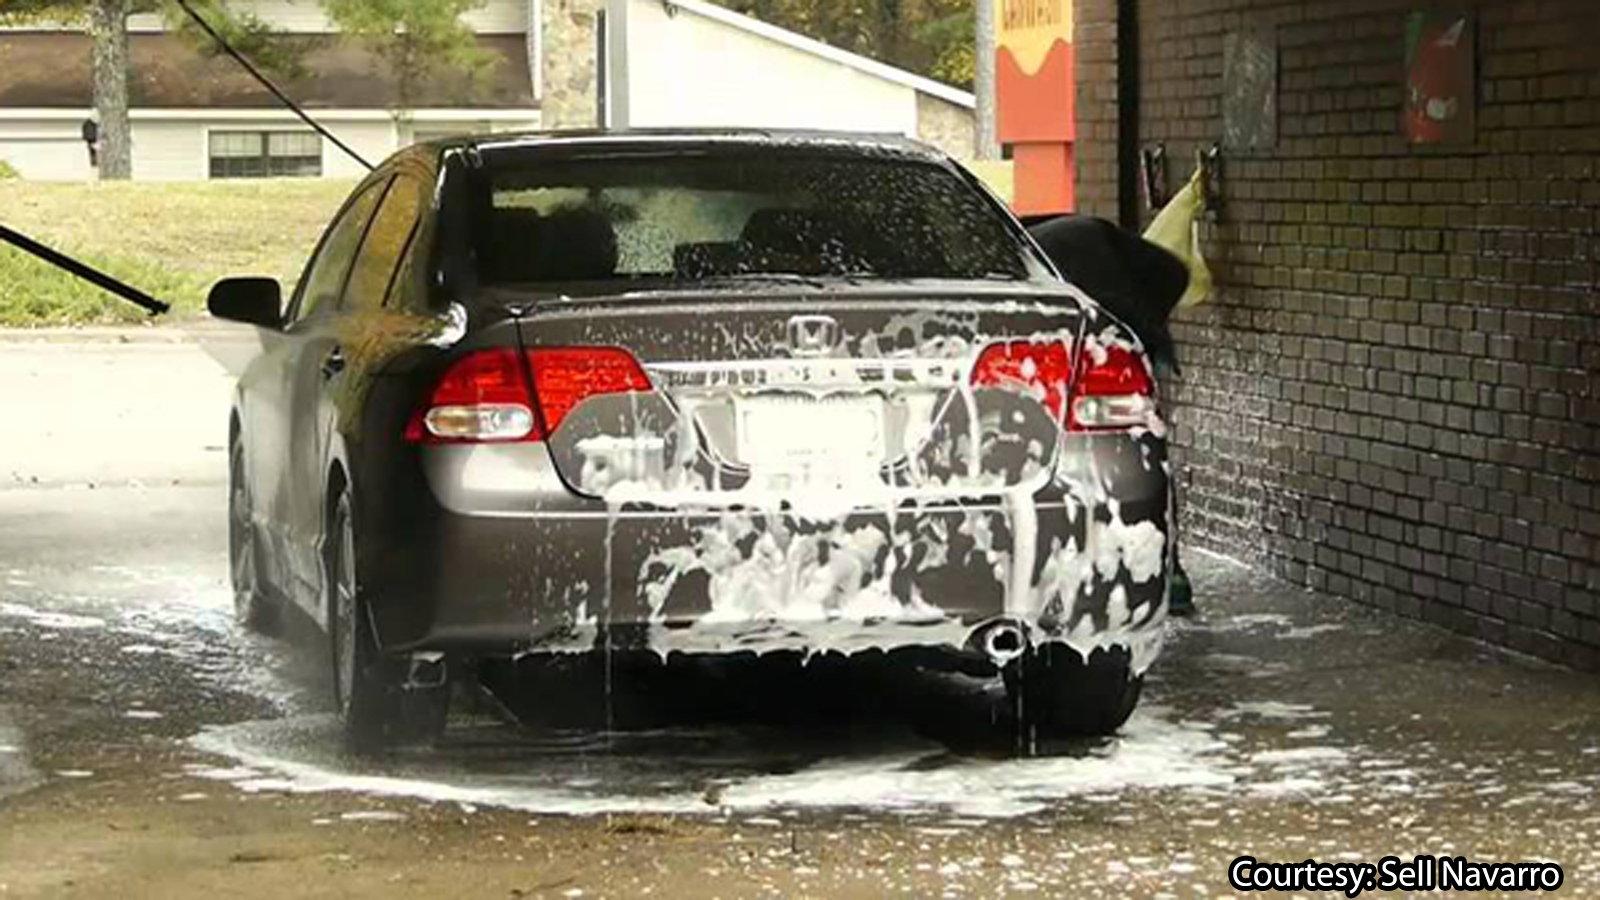 3. Wash Regularly